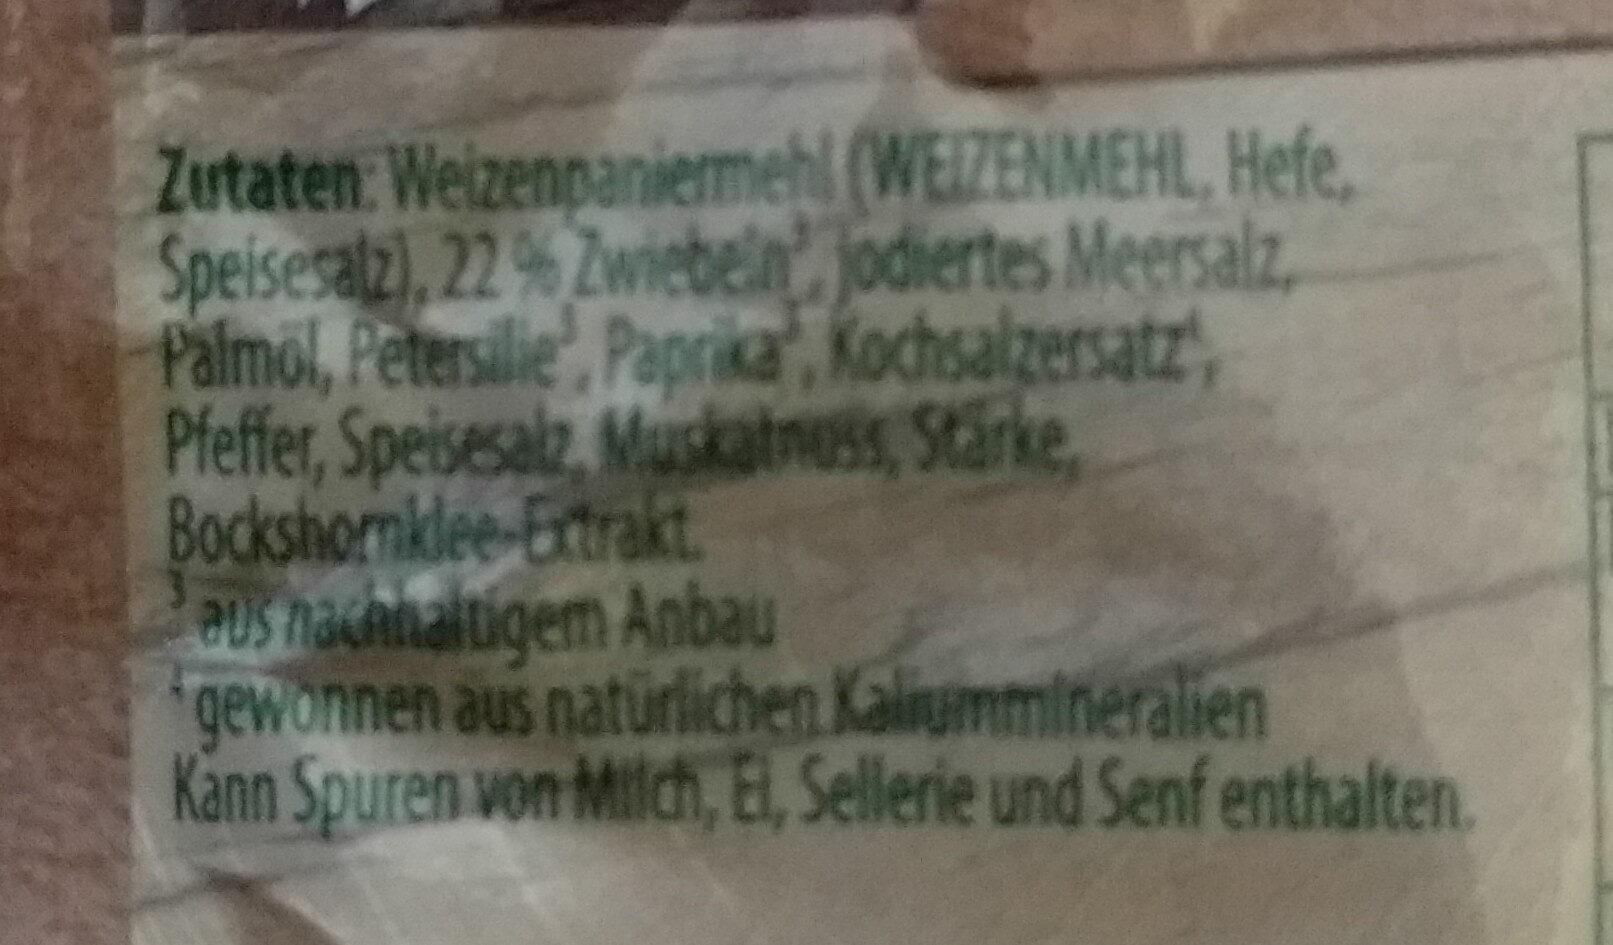 Knorr Fix, Hackbraten - Ingrédients - fr